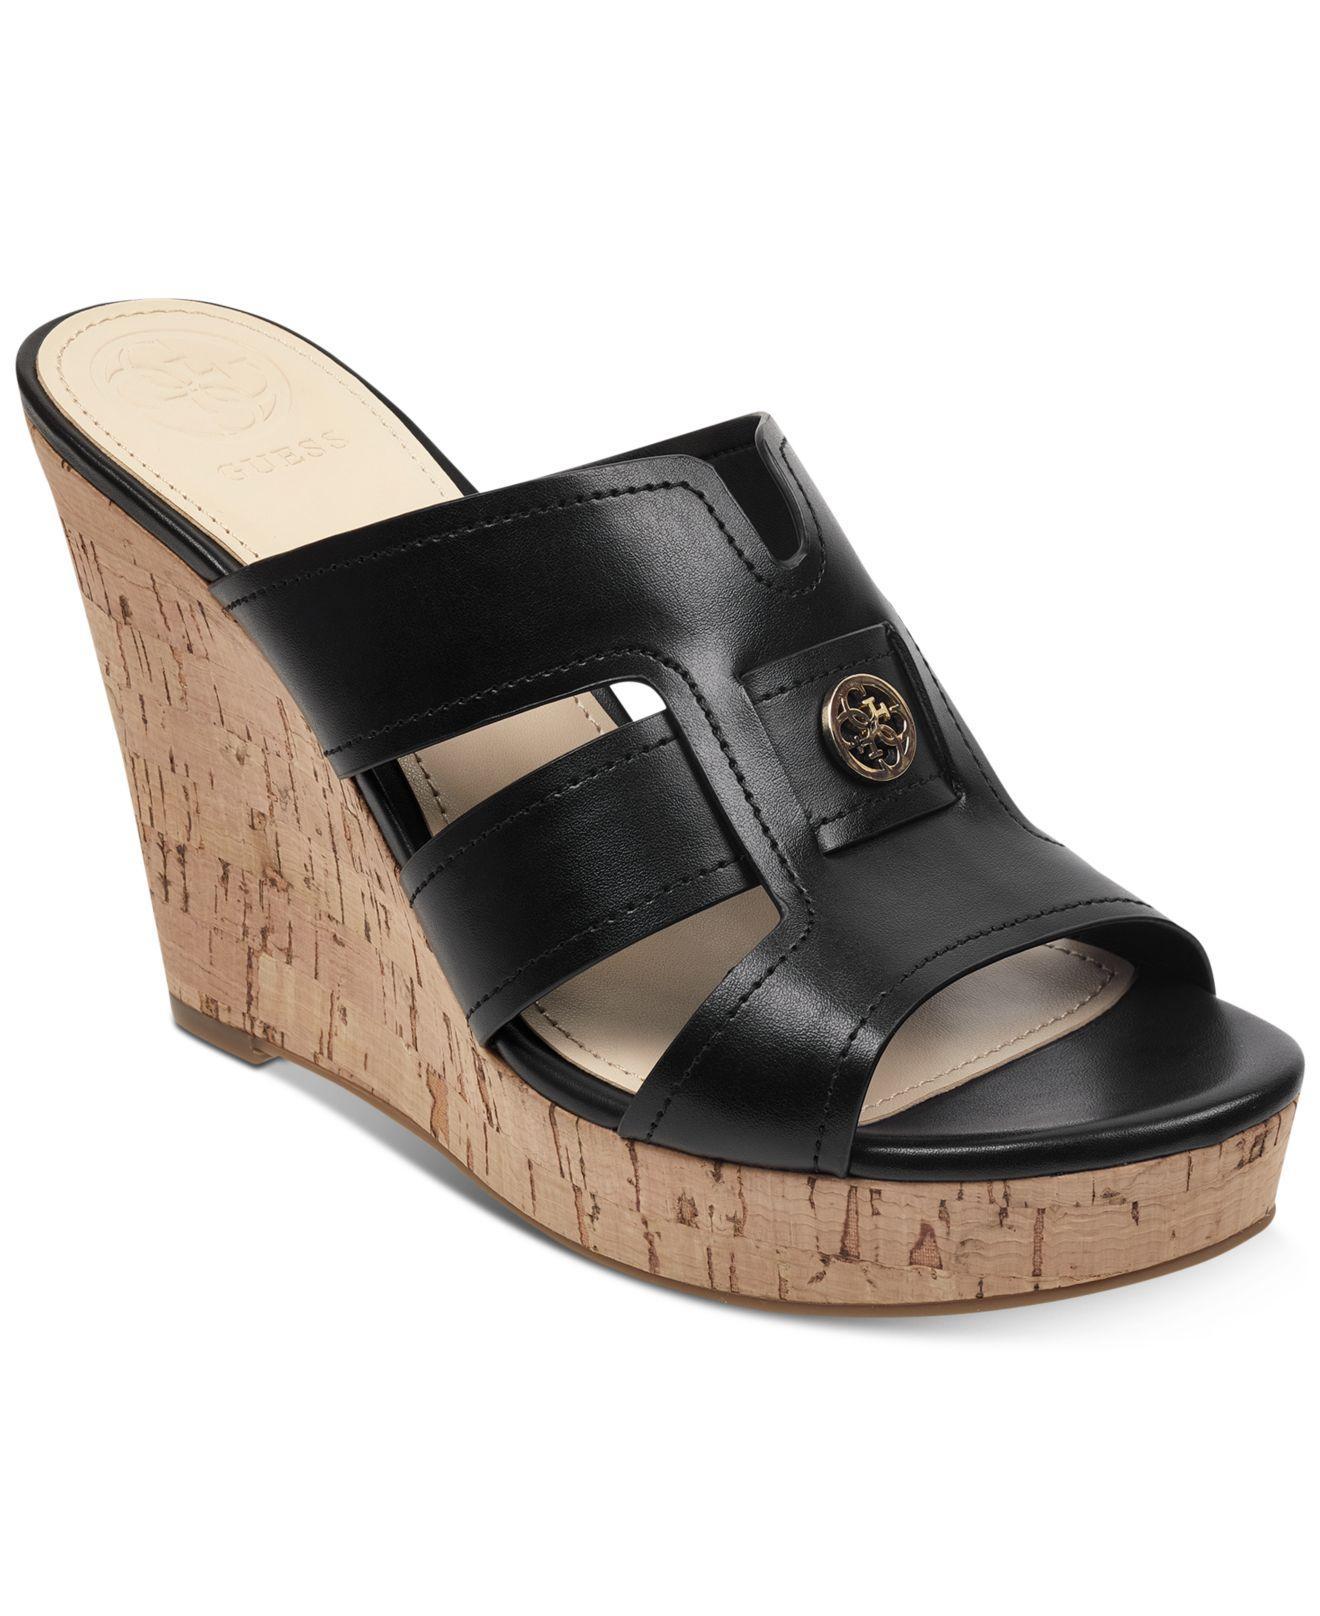 6dec73e12752 Lyst - Guess Eadra Wedge Slide Sandals in Black